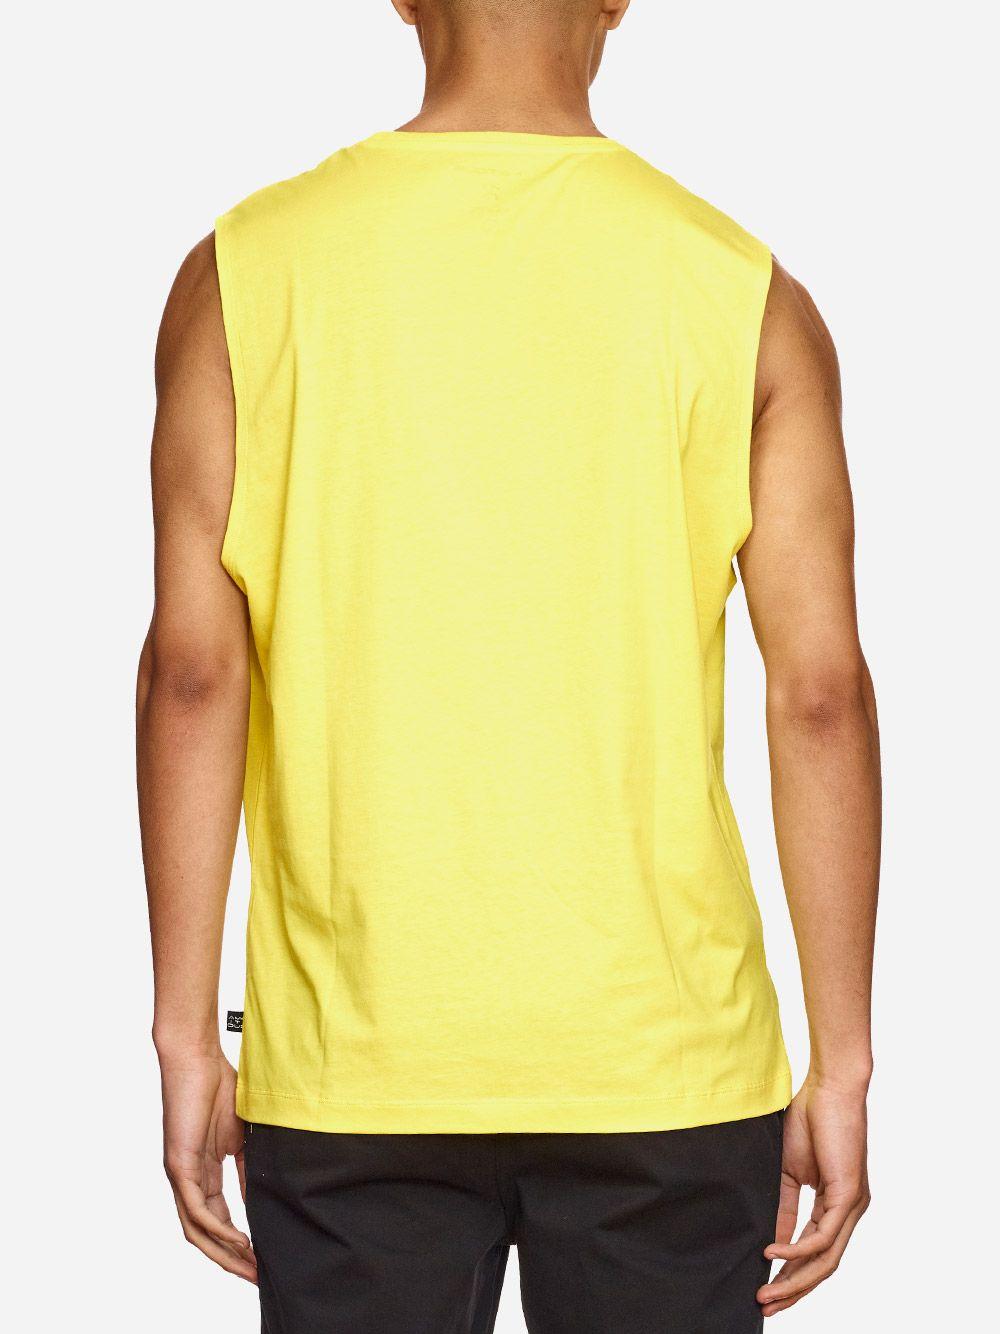 Caveada Amarela  Estampada | AMBITIOUS